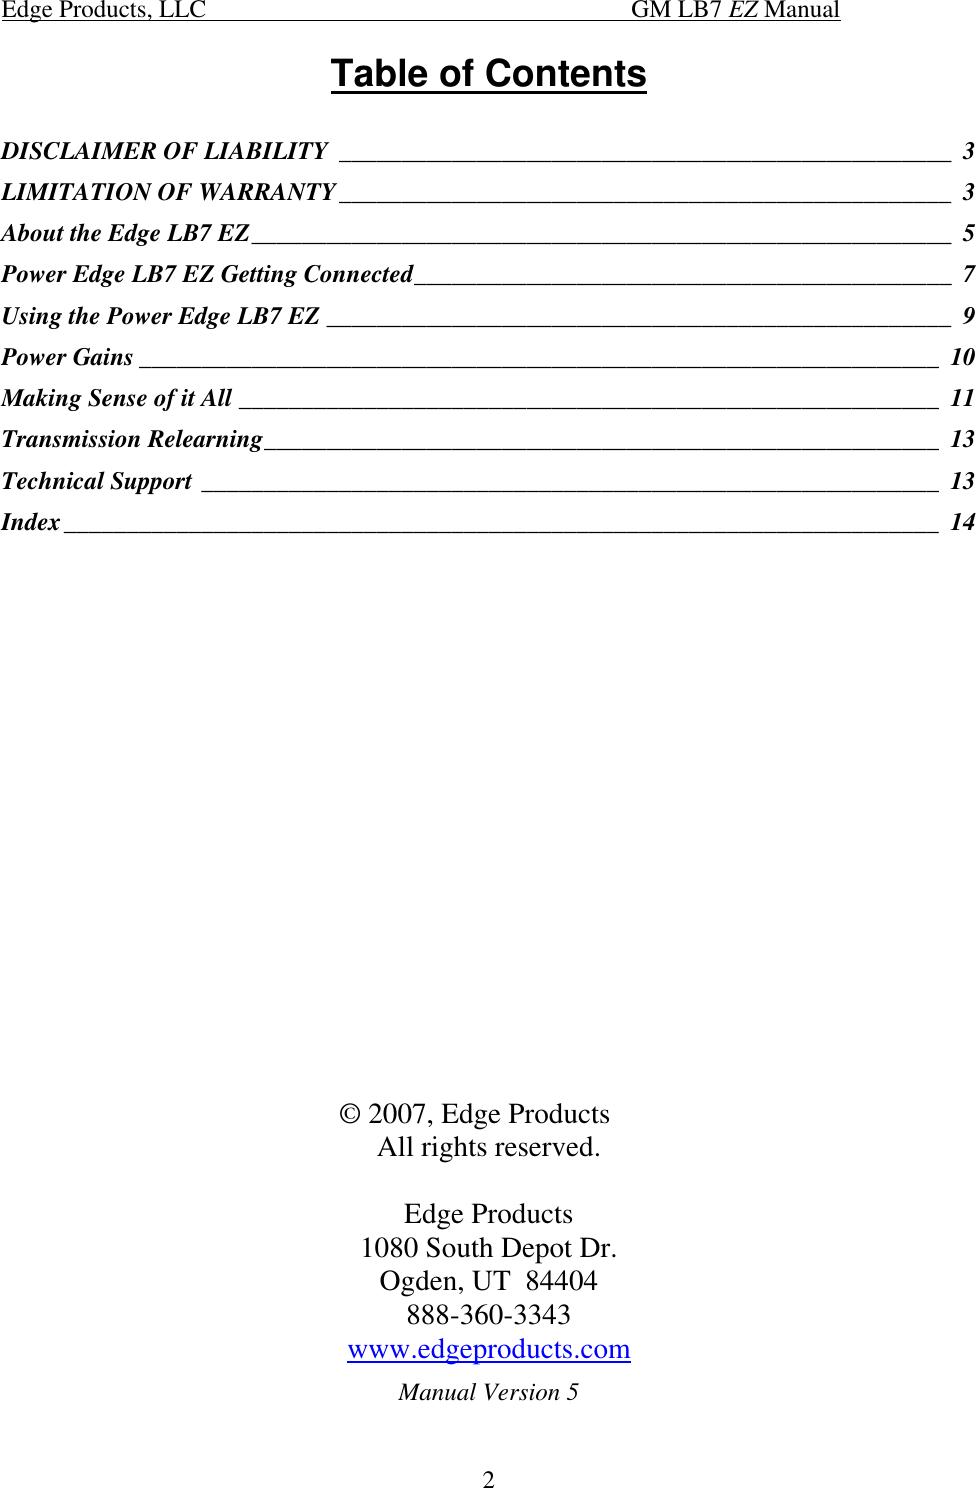 Edge Tech Gm Duramax 20200 Users Manual Installation